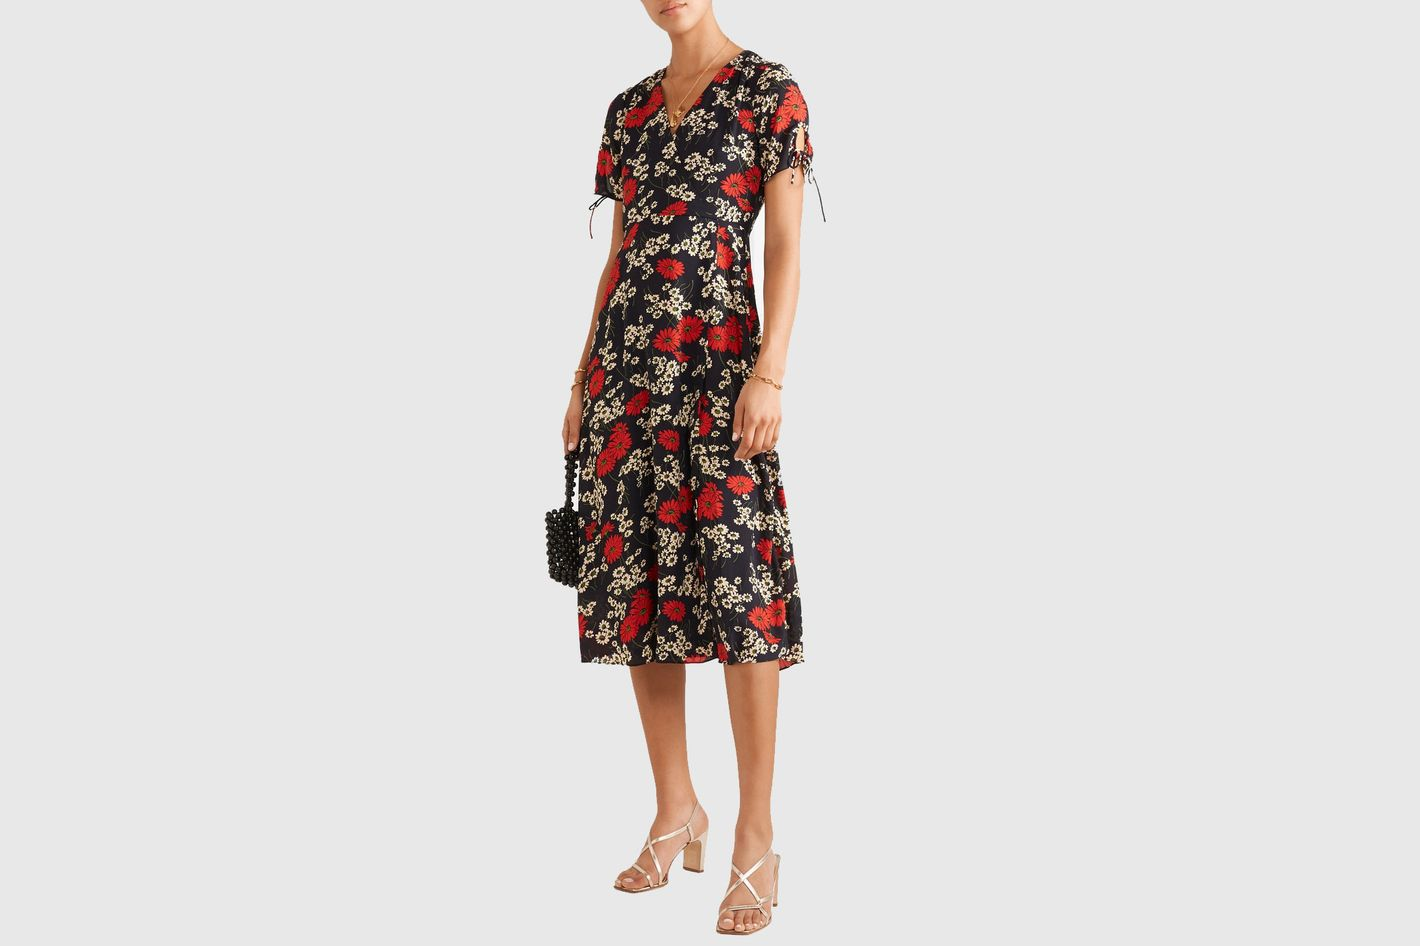 Madewell Wrap-effect Floral Midi Dress